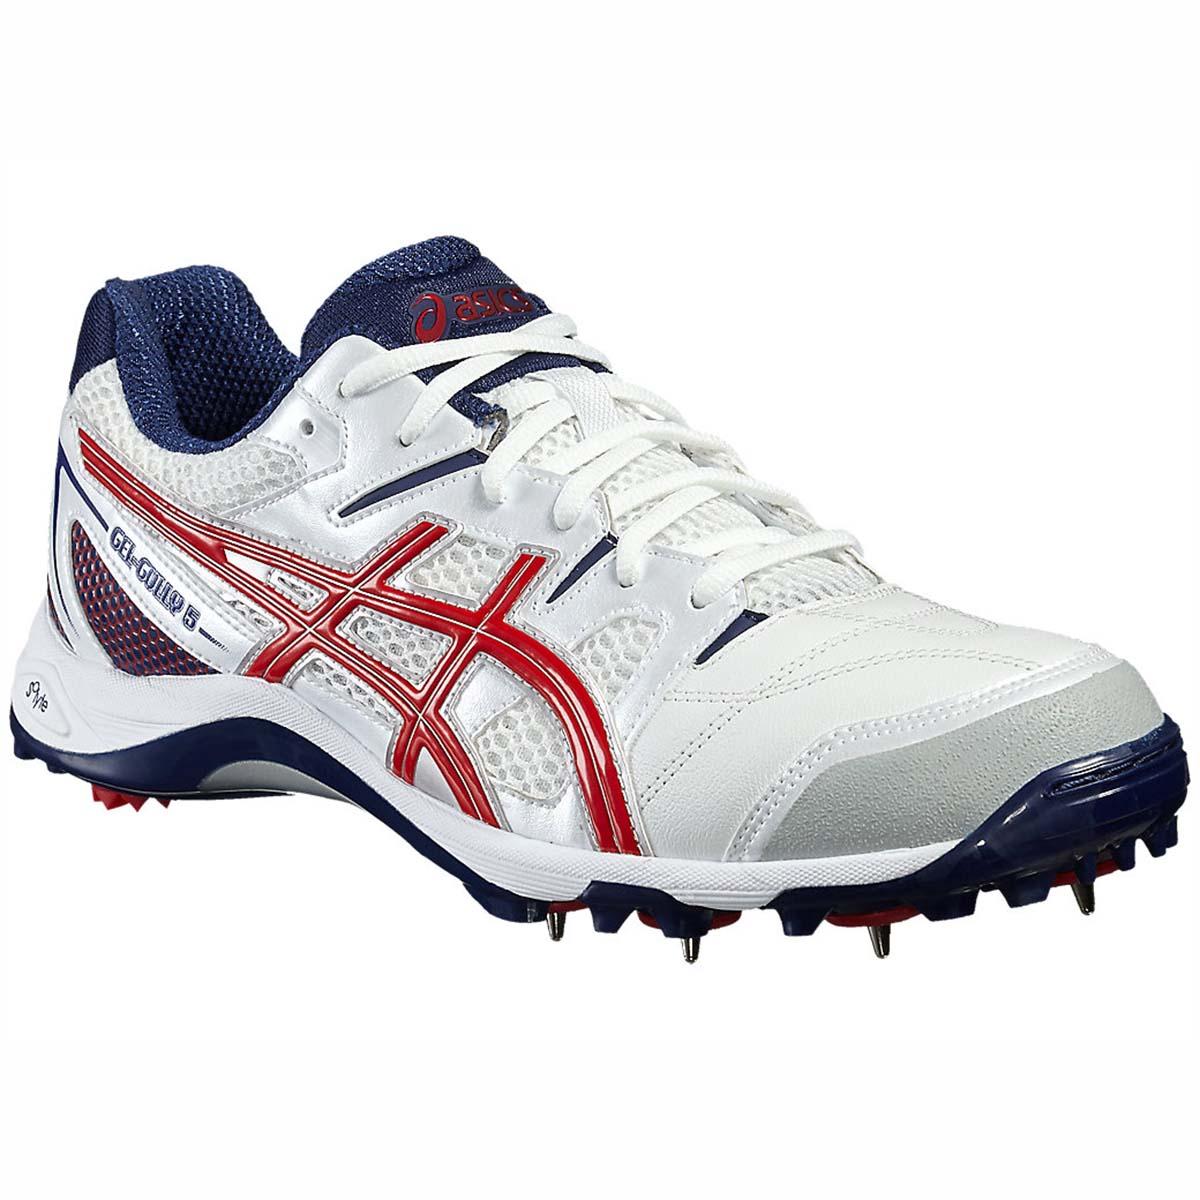 Buy Asics Gel Gully 5 Cricket Shoes